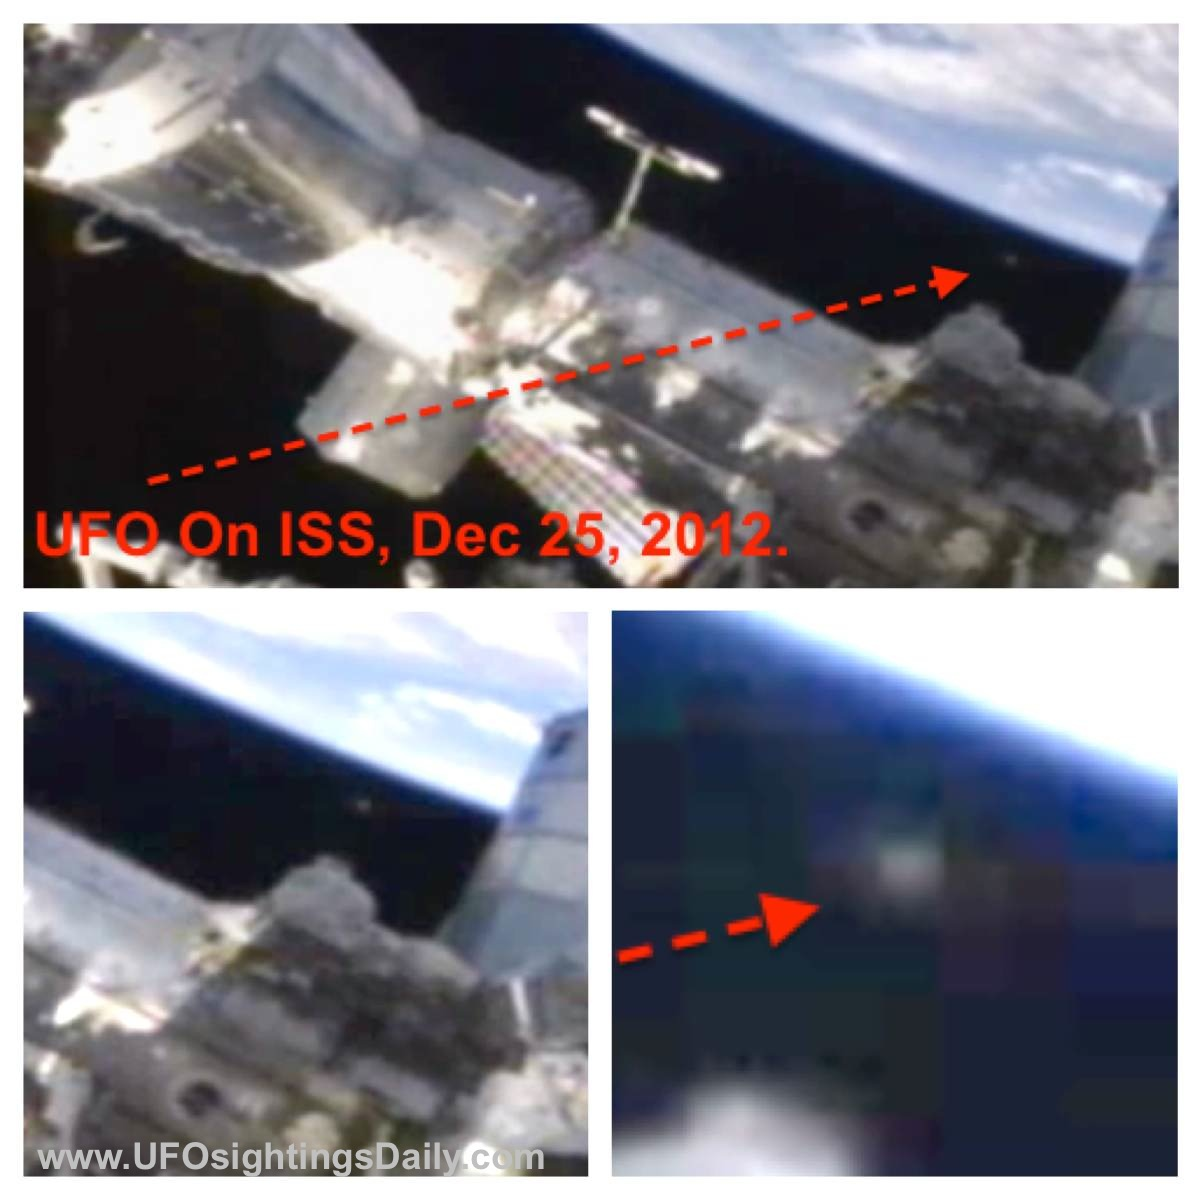 UFO SIGHTINGS DAILY: UFO Seen Near International Space ...